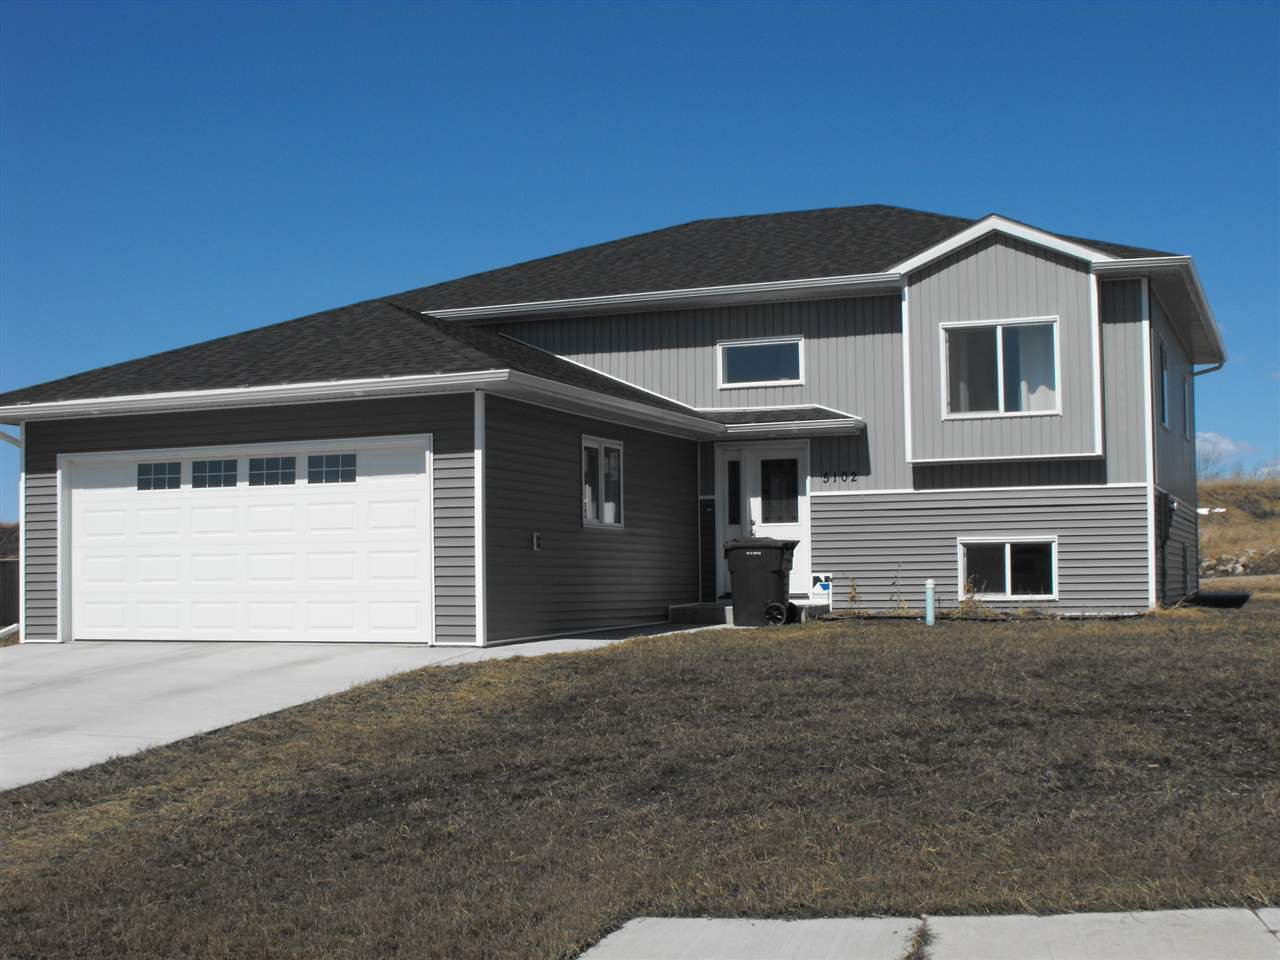 Main Photo: 5102 60 Avenue: Elk Point House for sale : MLS®# E4100946